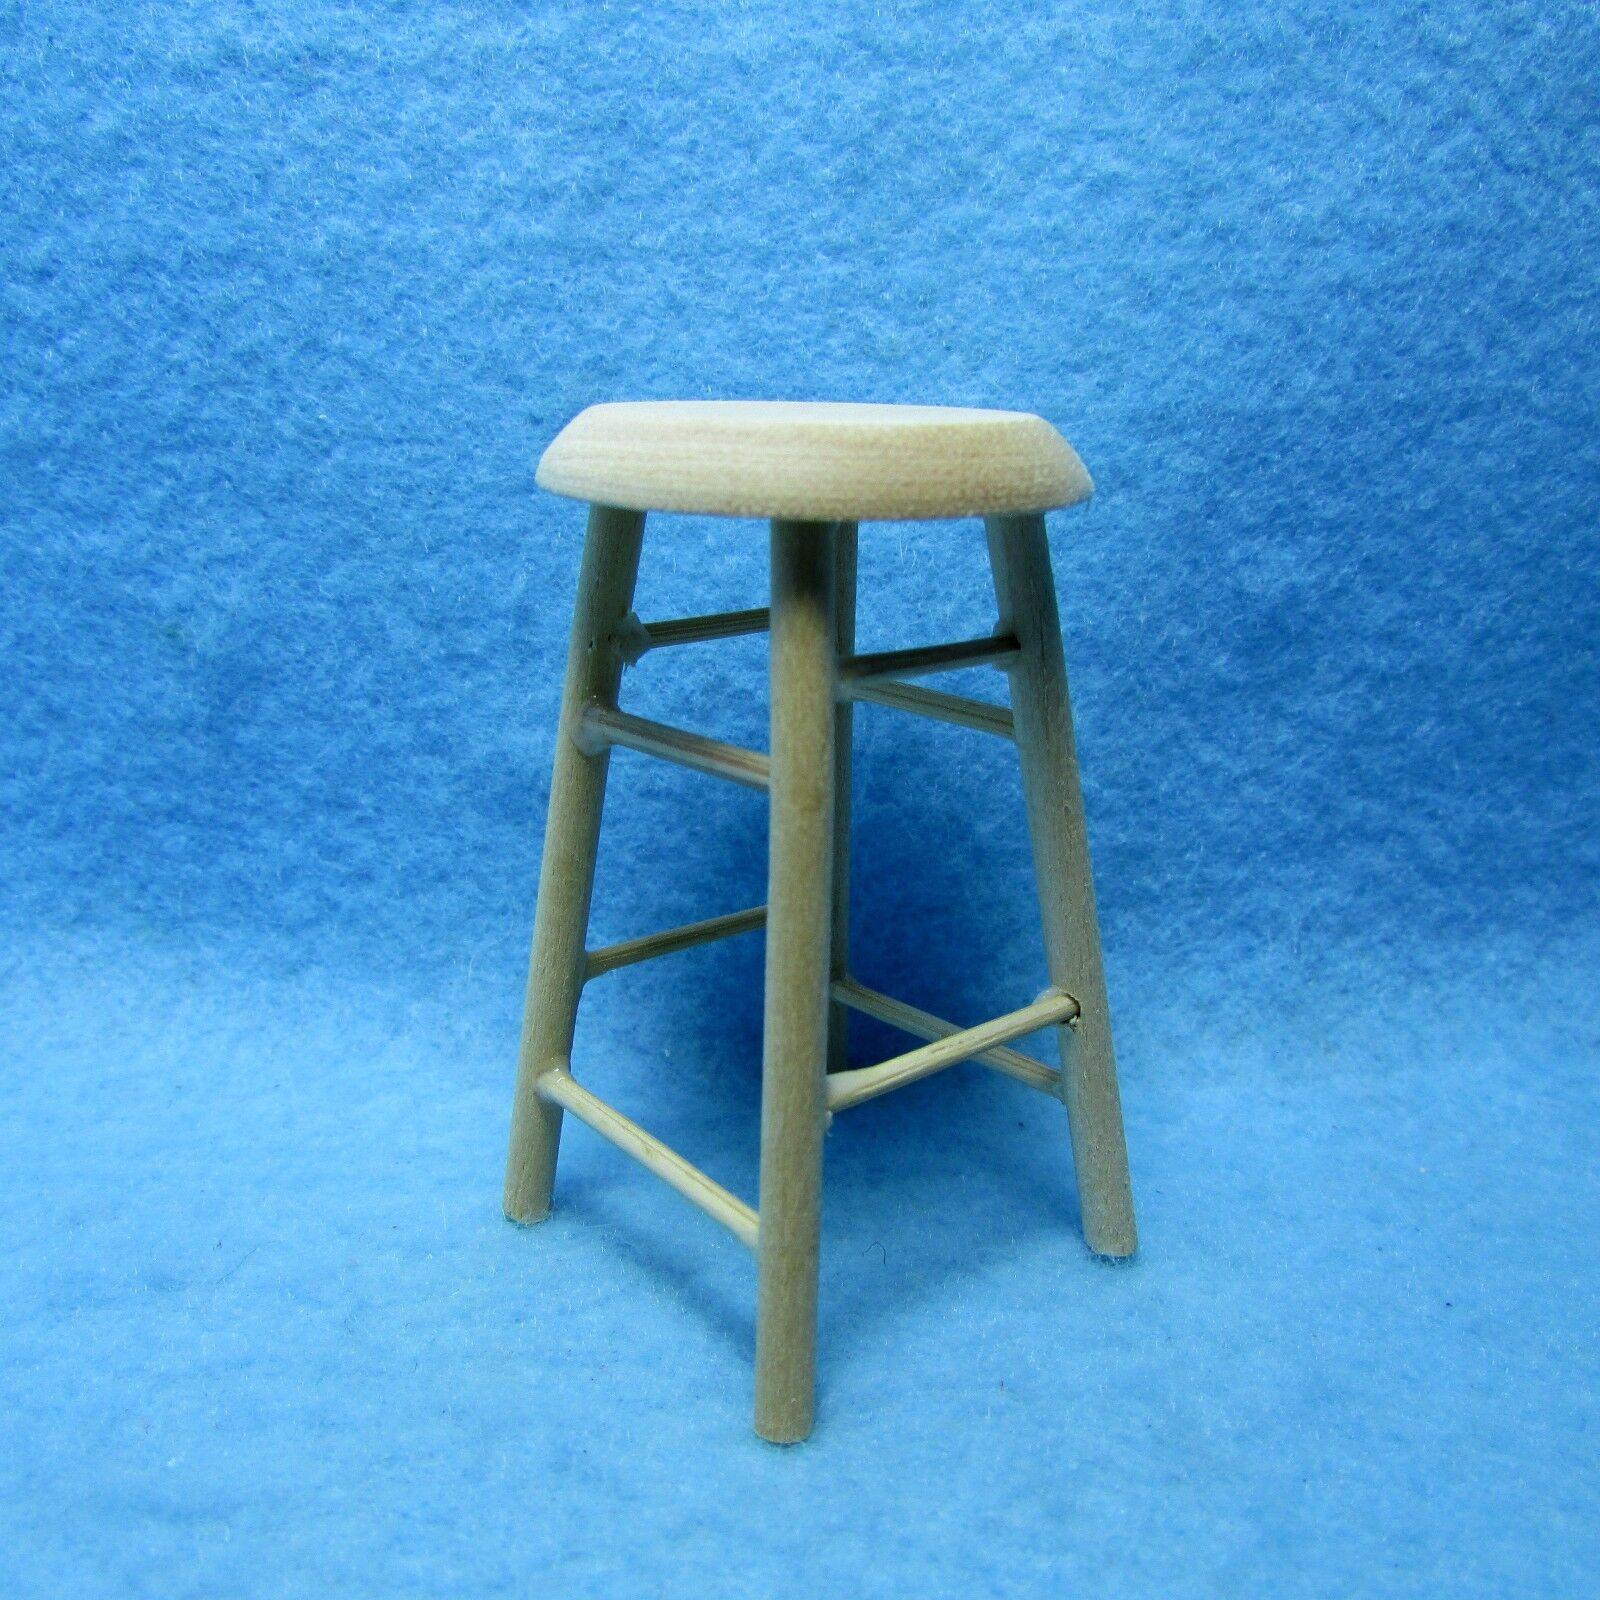 Dollhouse Miniature Wooden Bar Stool / Stool Unfinished / Na